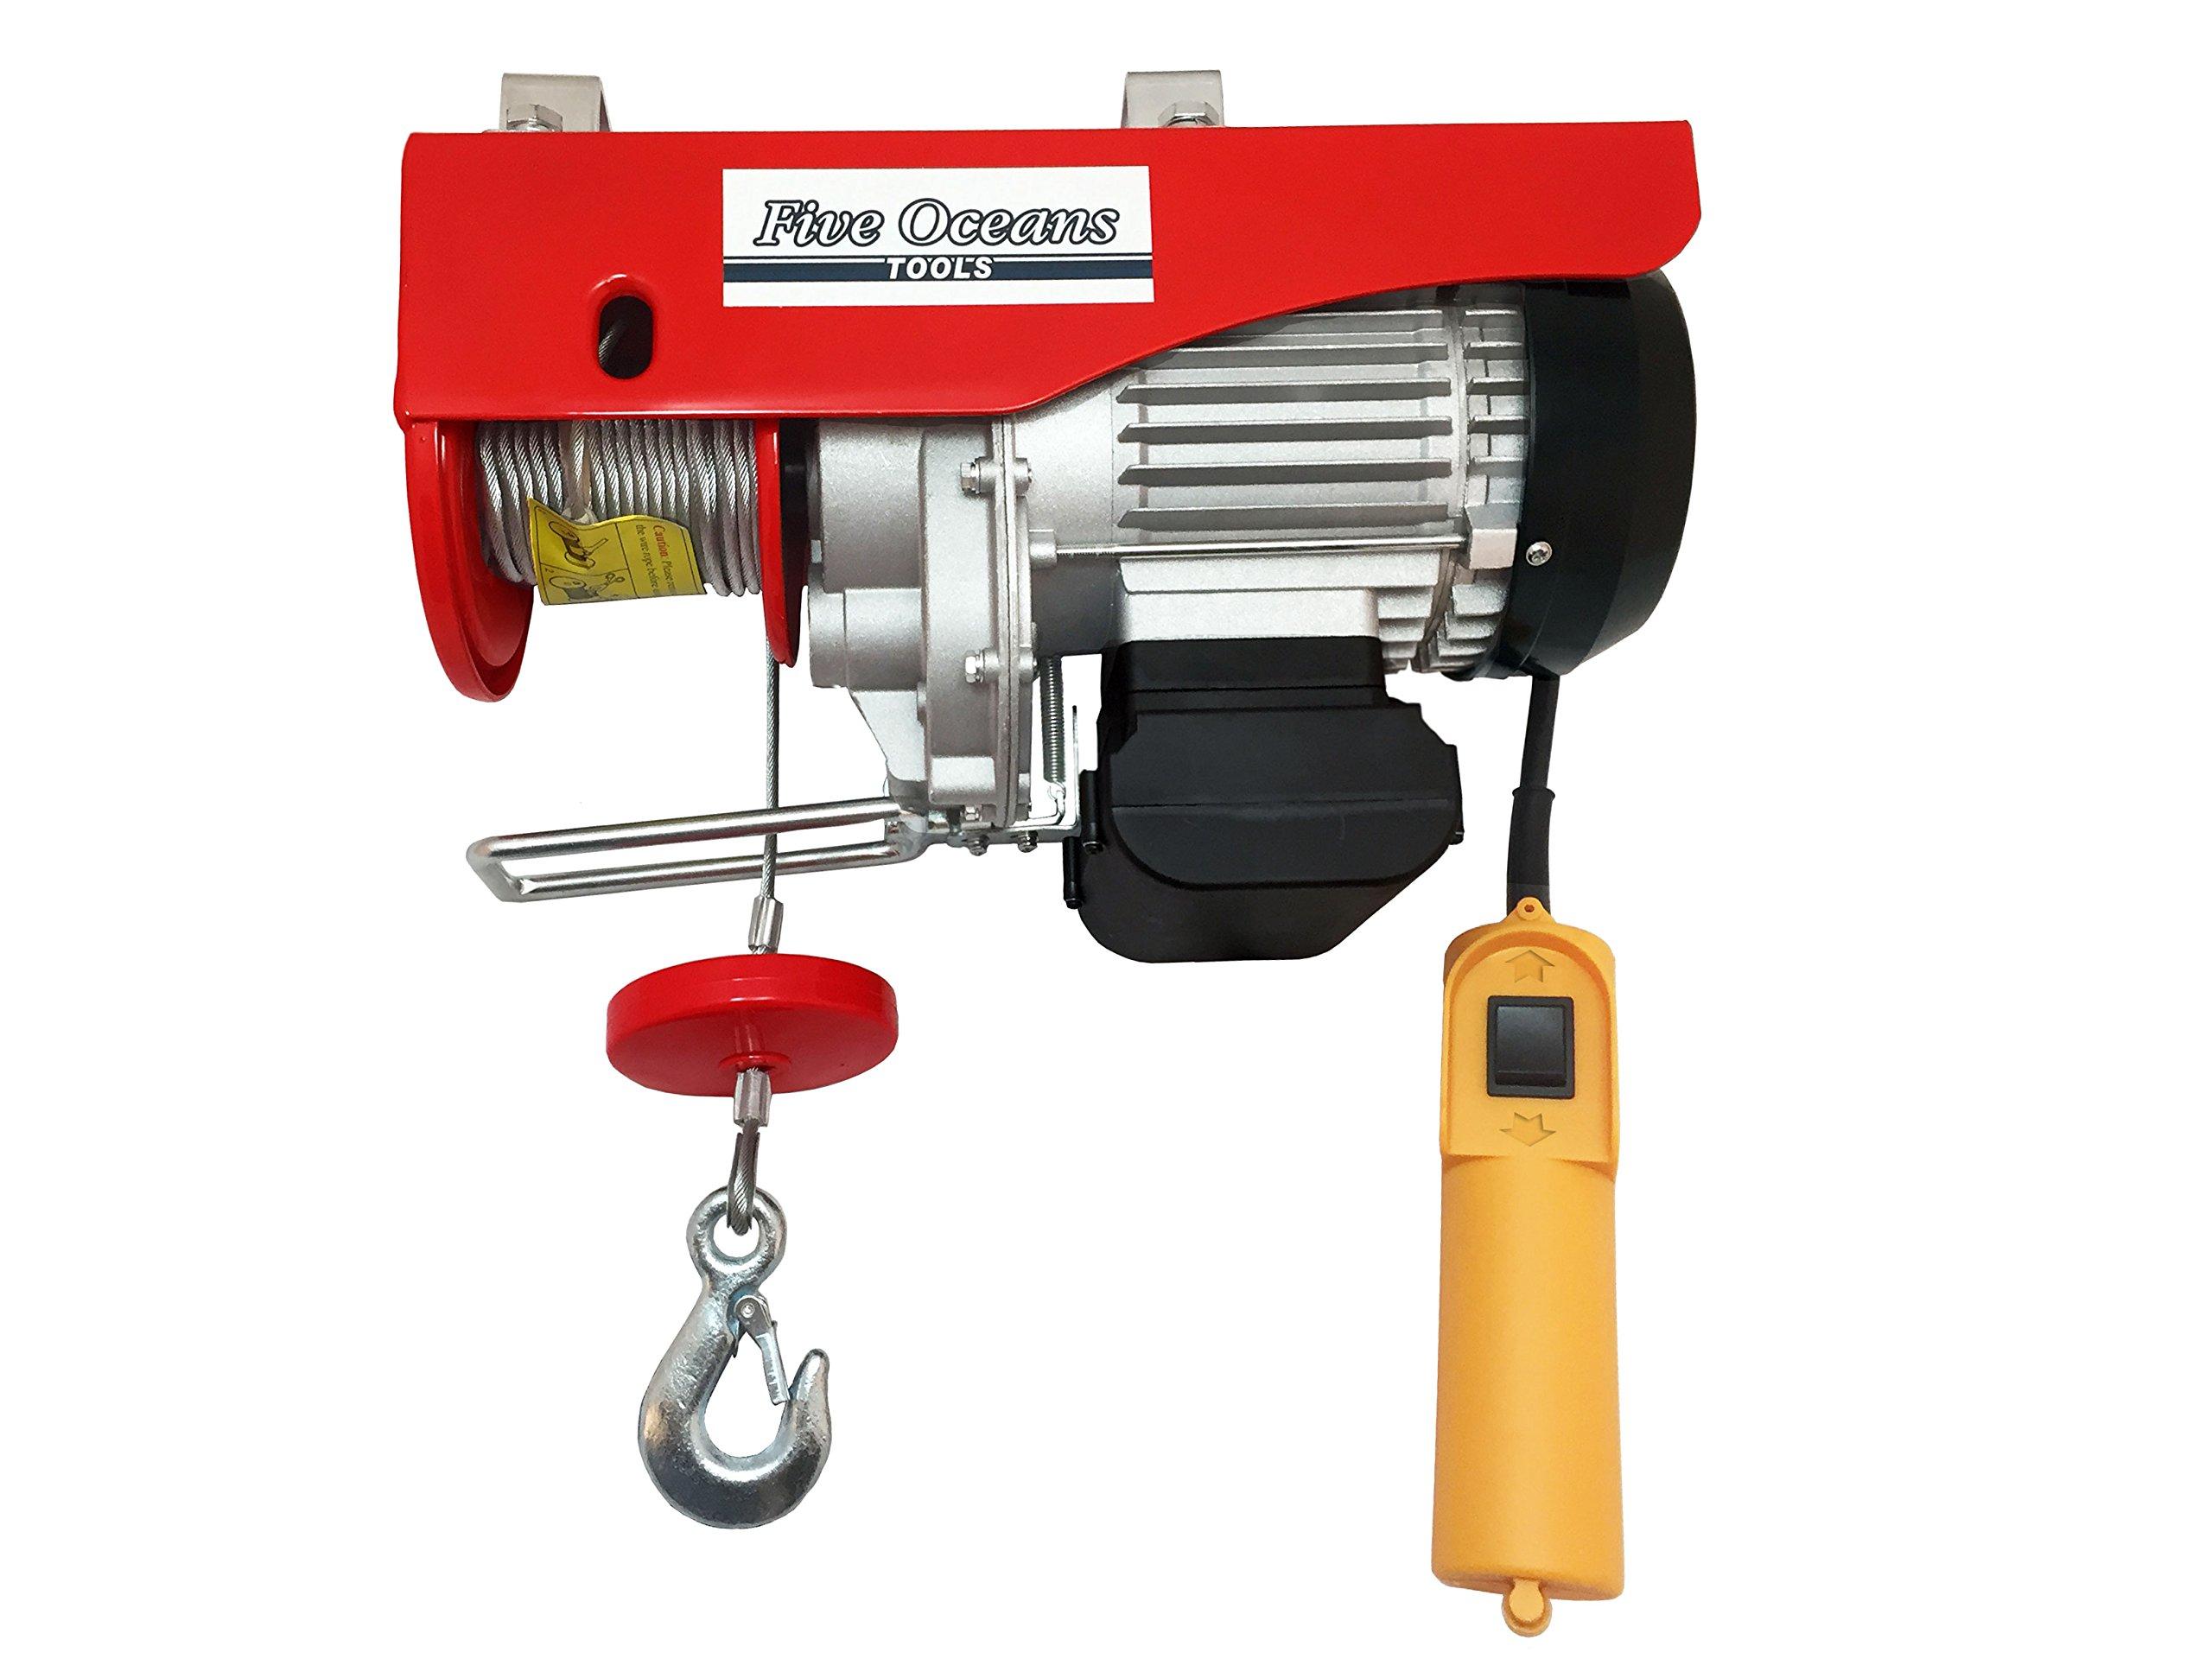 2200lb Overhead Electric Hoist Crane Lift Garage Winch W/remote 110v- Five Oceans